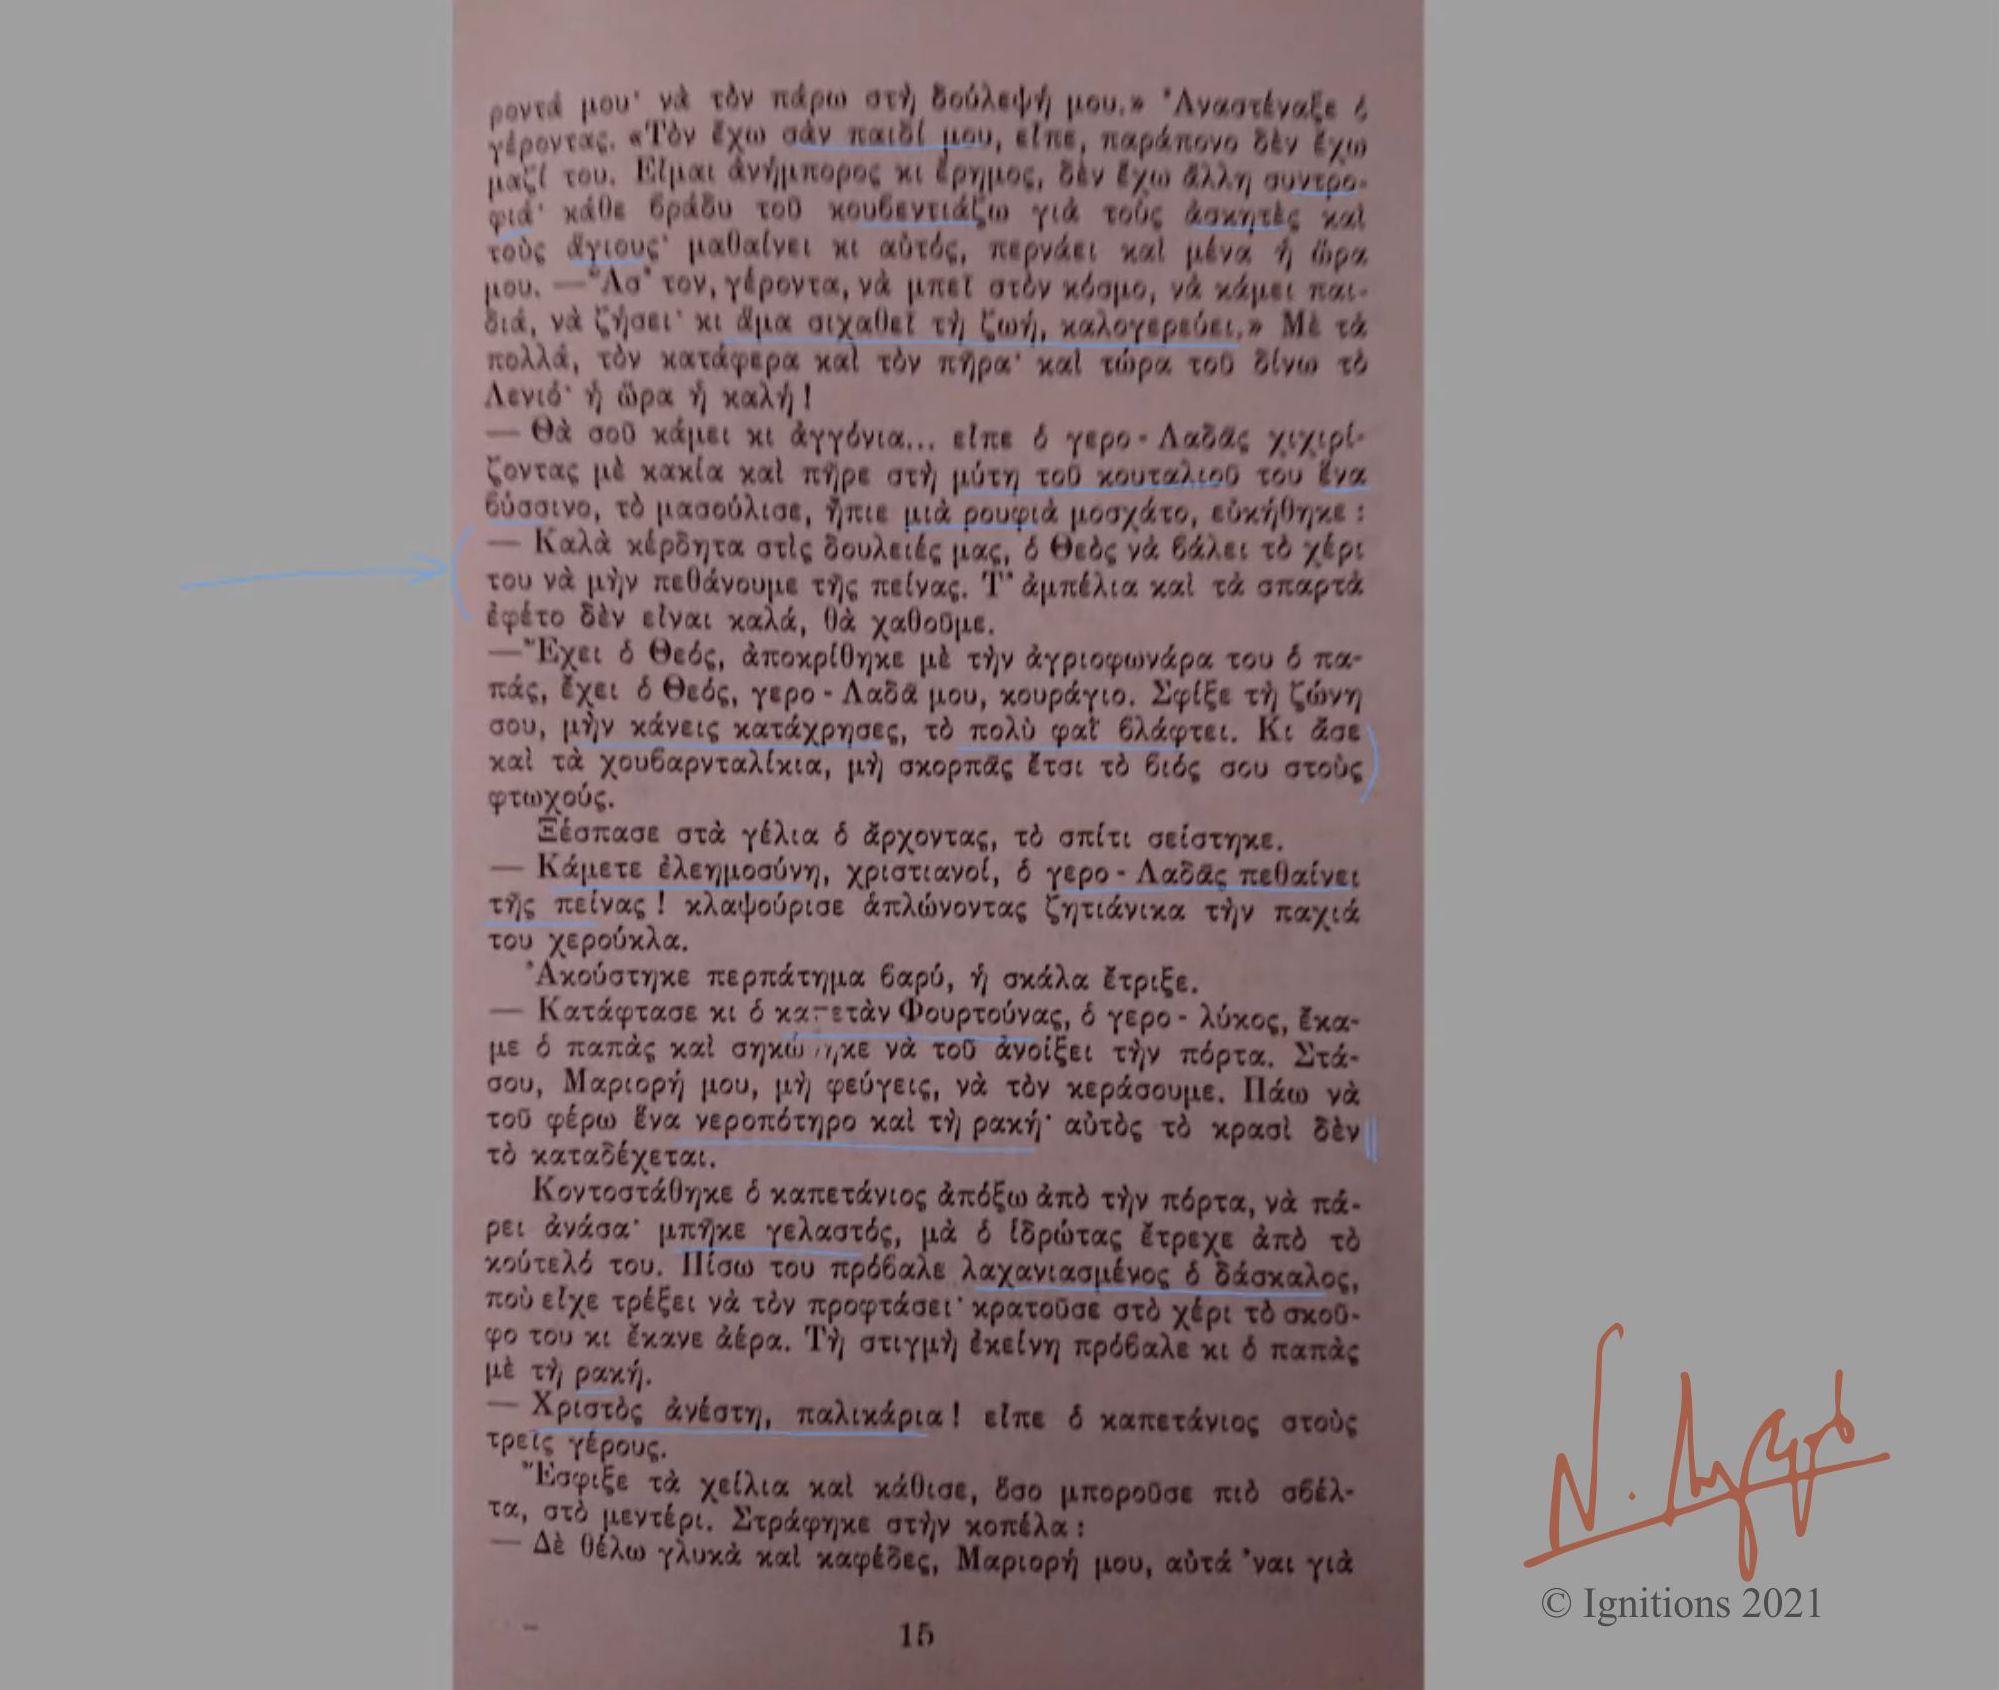 60110 - X - Η συνέχεια της Σταύρωσης του Χριστού. Συνέχεια IX. (Dessin)